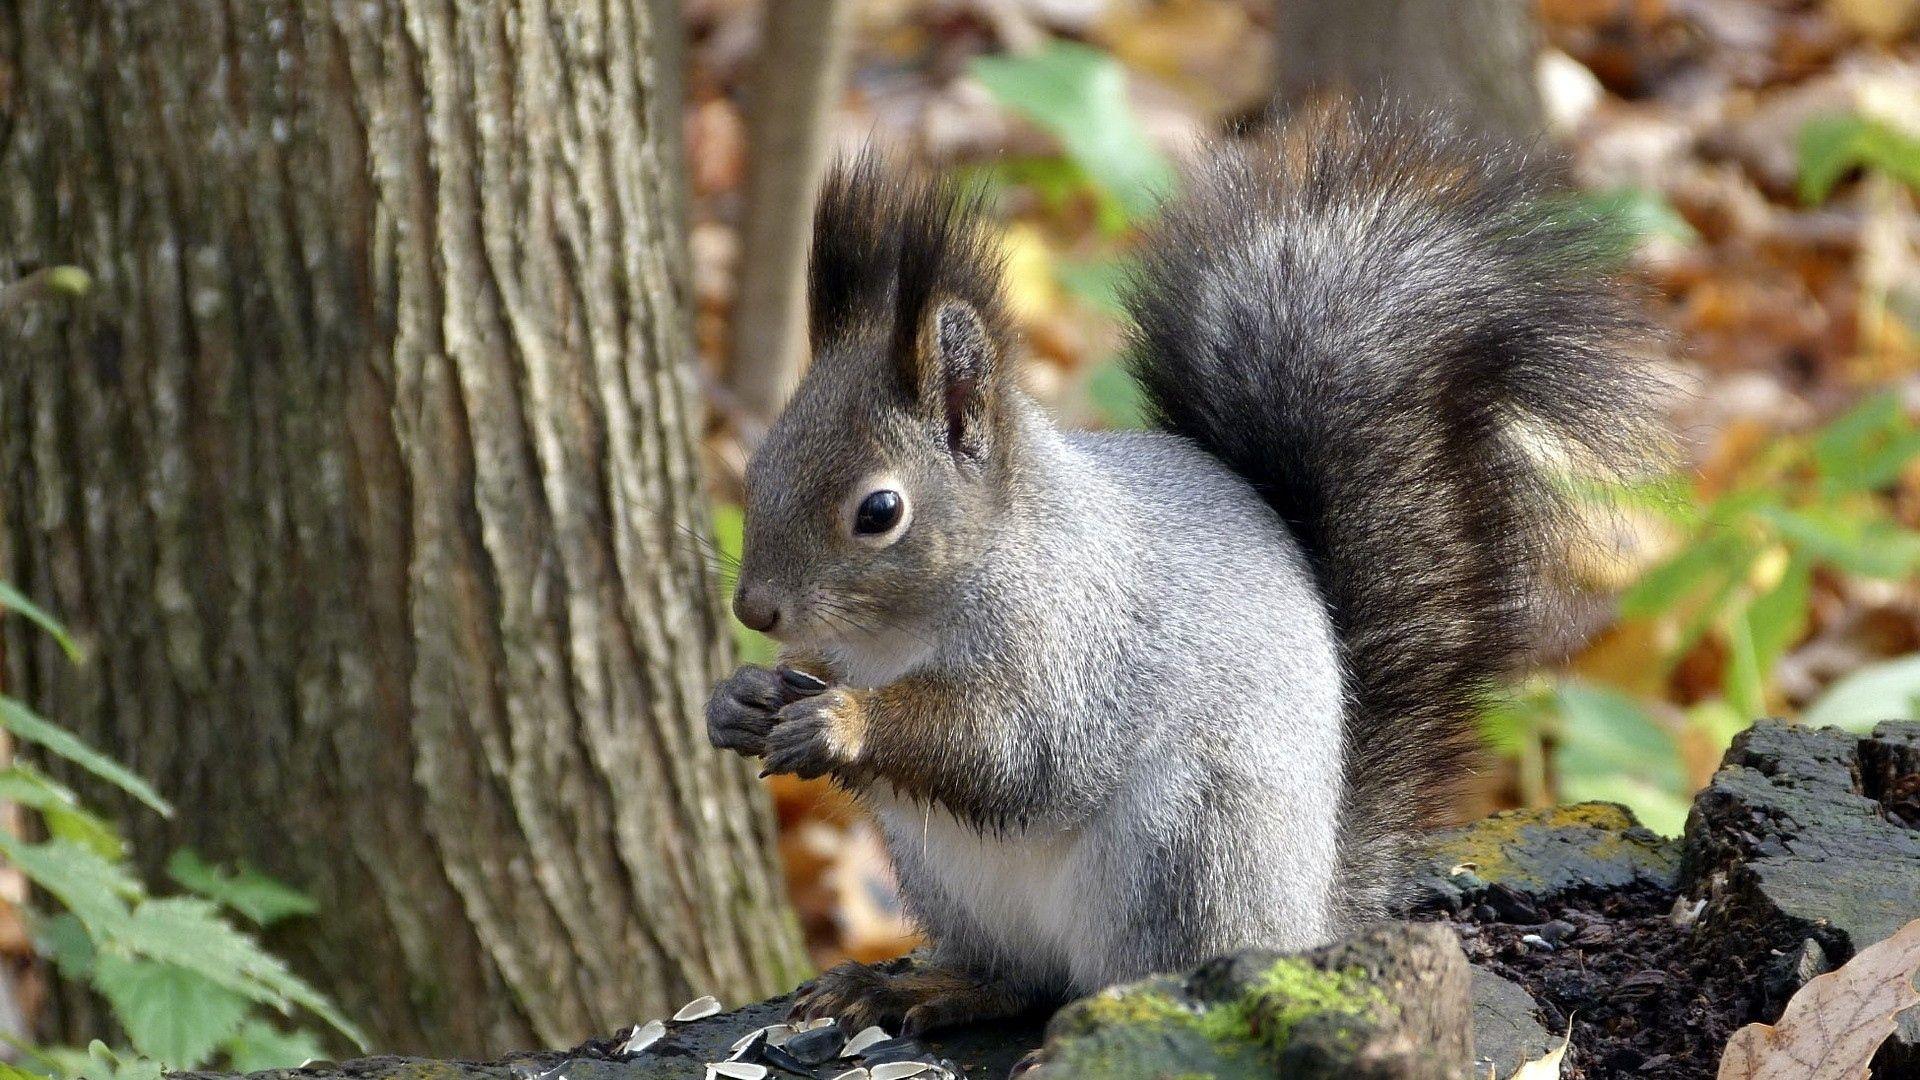 Wallpaper Autumn Squirrel